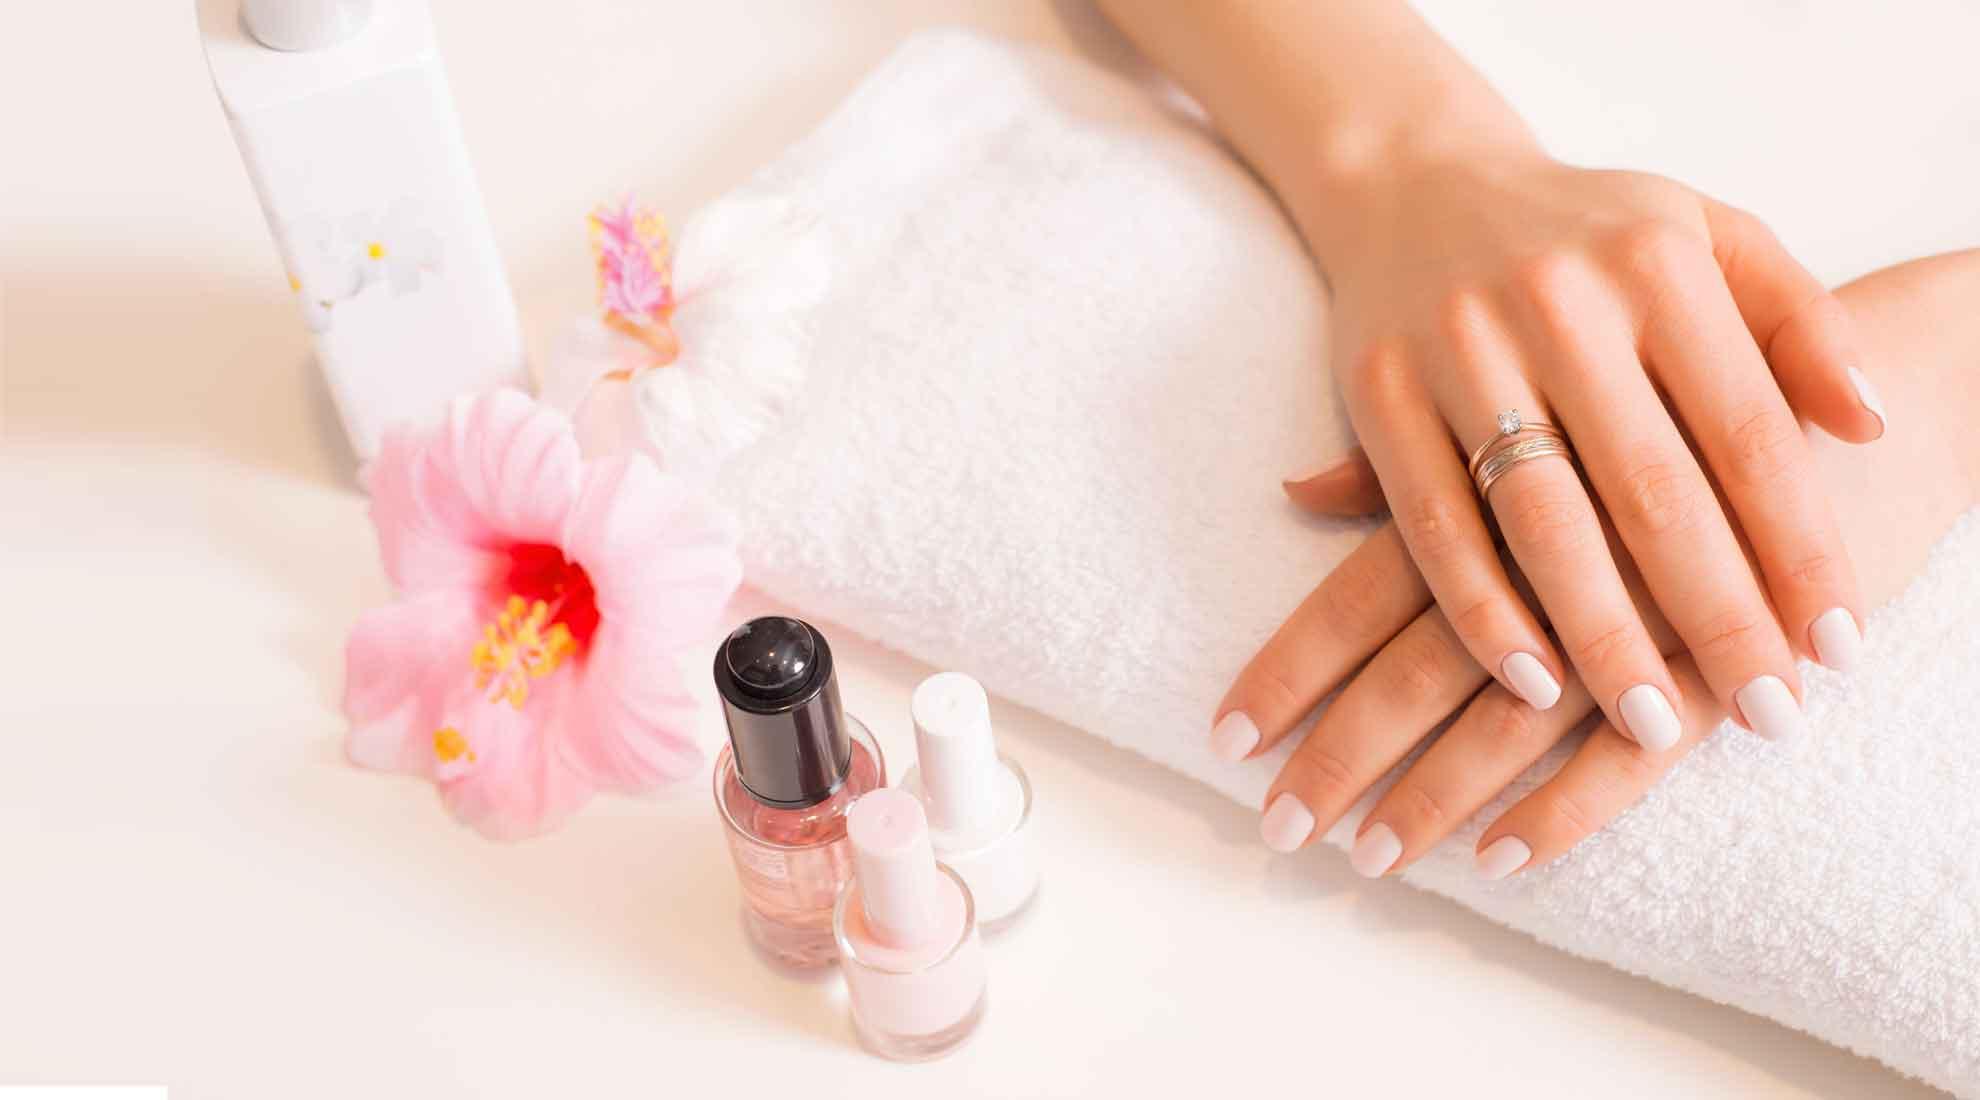 Nail Salon Manicures Pedicures Waxing Kitchener Waterloo